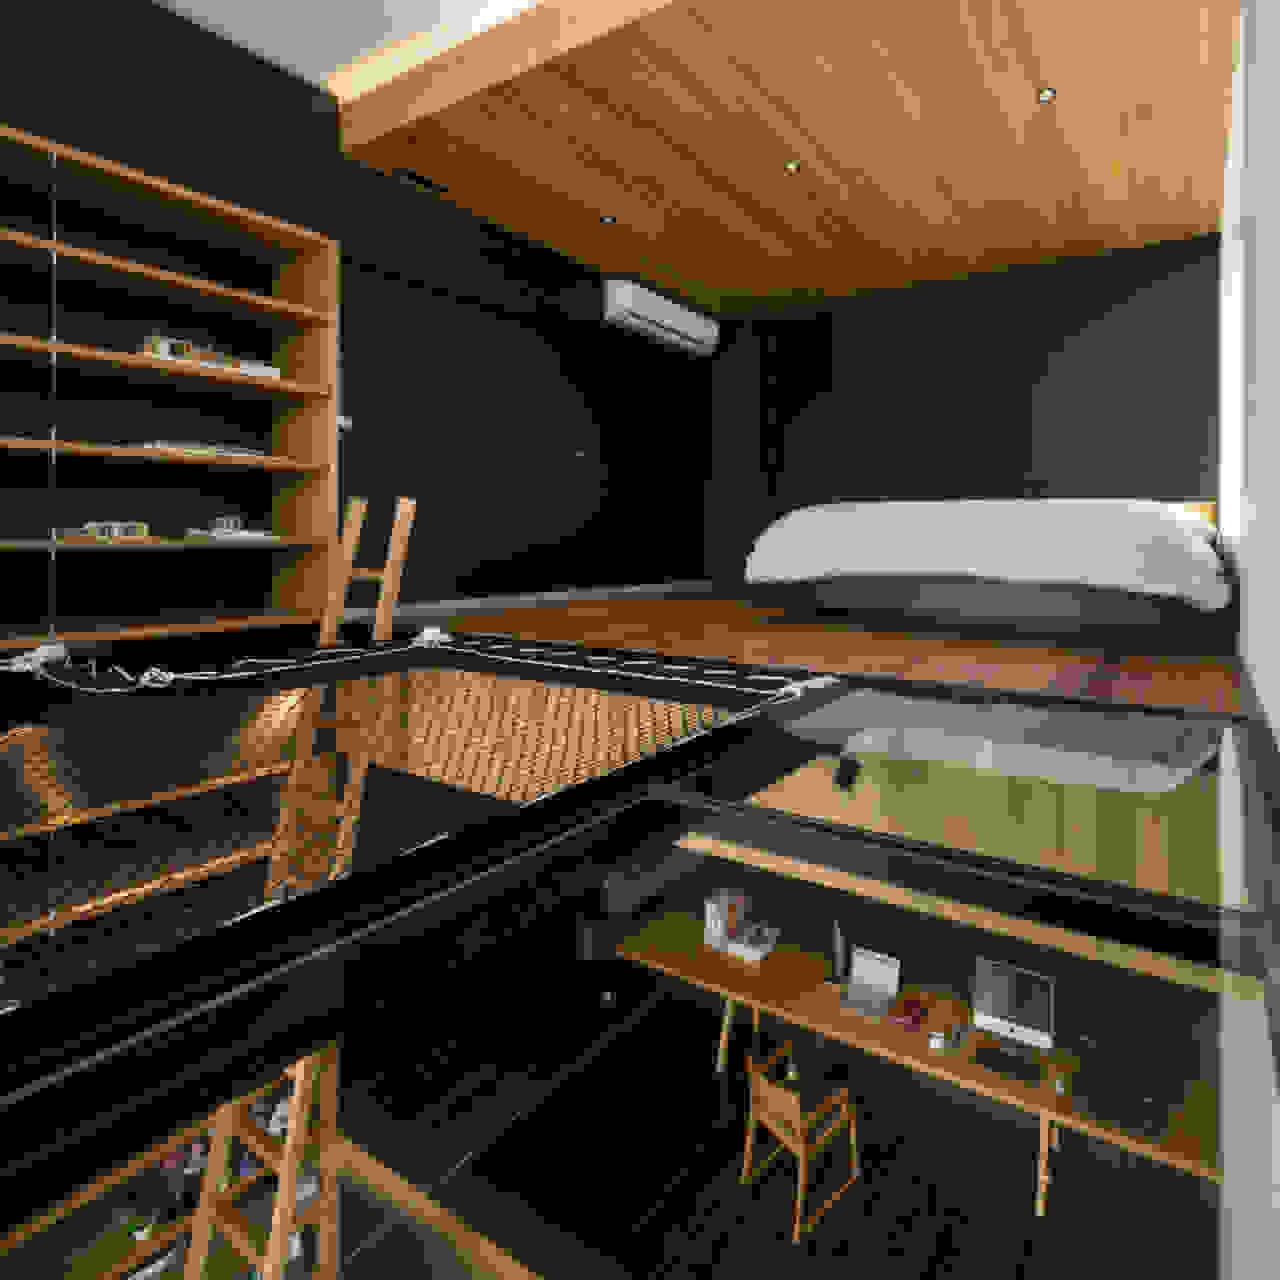 Recreational mezzanine | Source: homedit.com